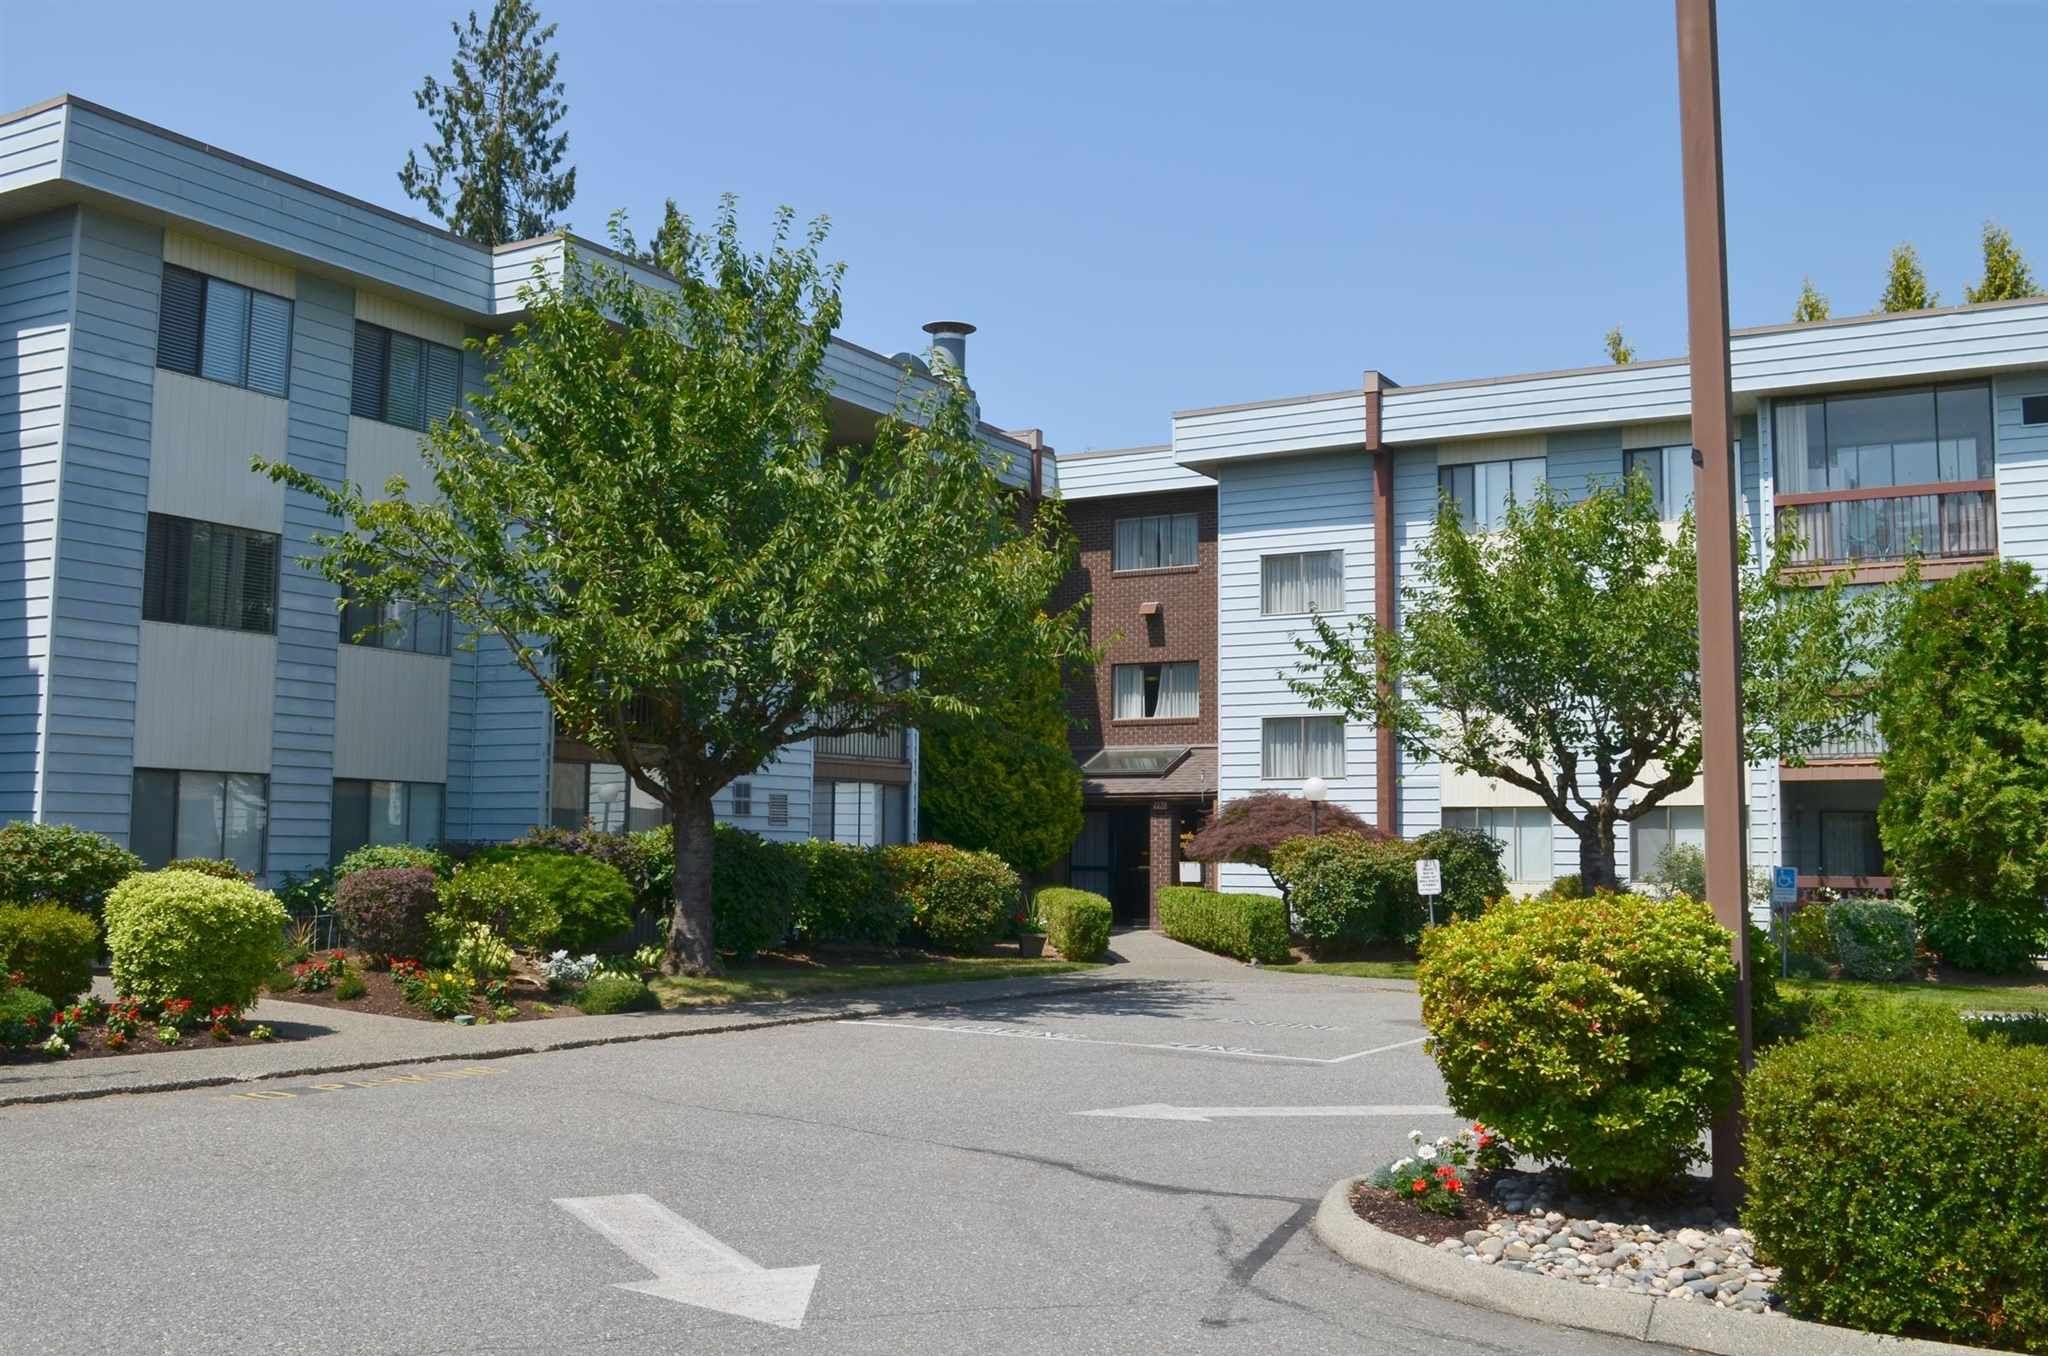 "Main Photo: 107 2279 MCCALLUM Road in Abbotsford: Central Abbotsford Condo for sale in ""Alemeda Court"" : MLS®# R2598839"